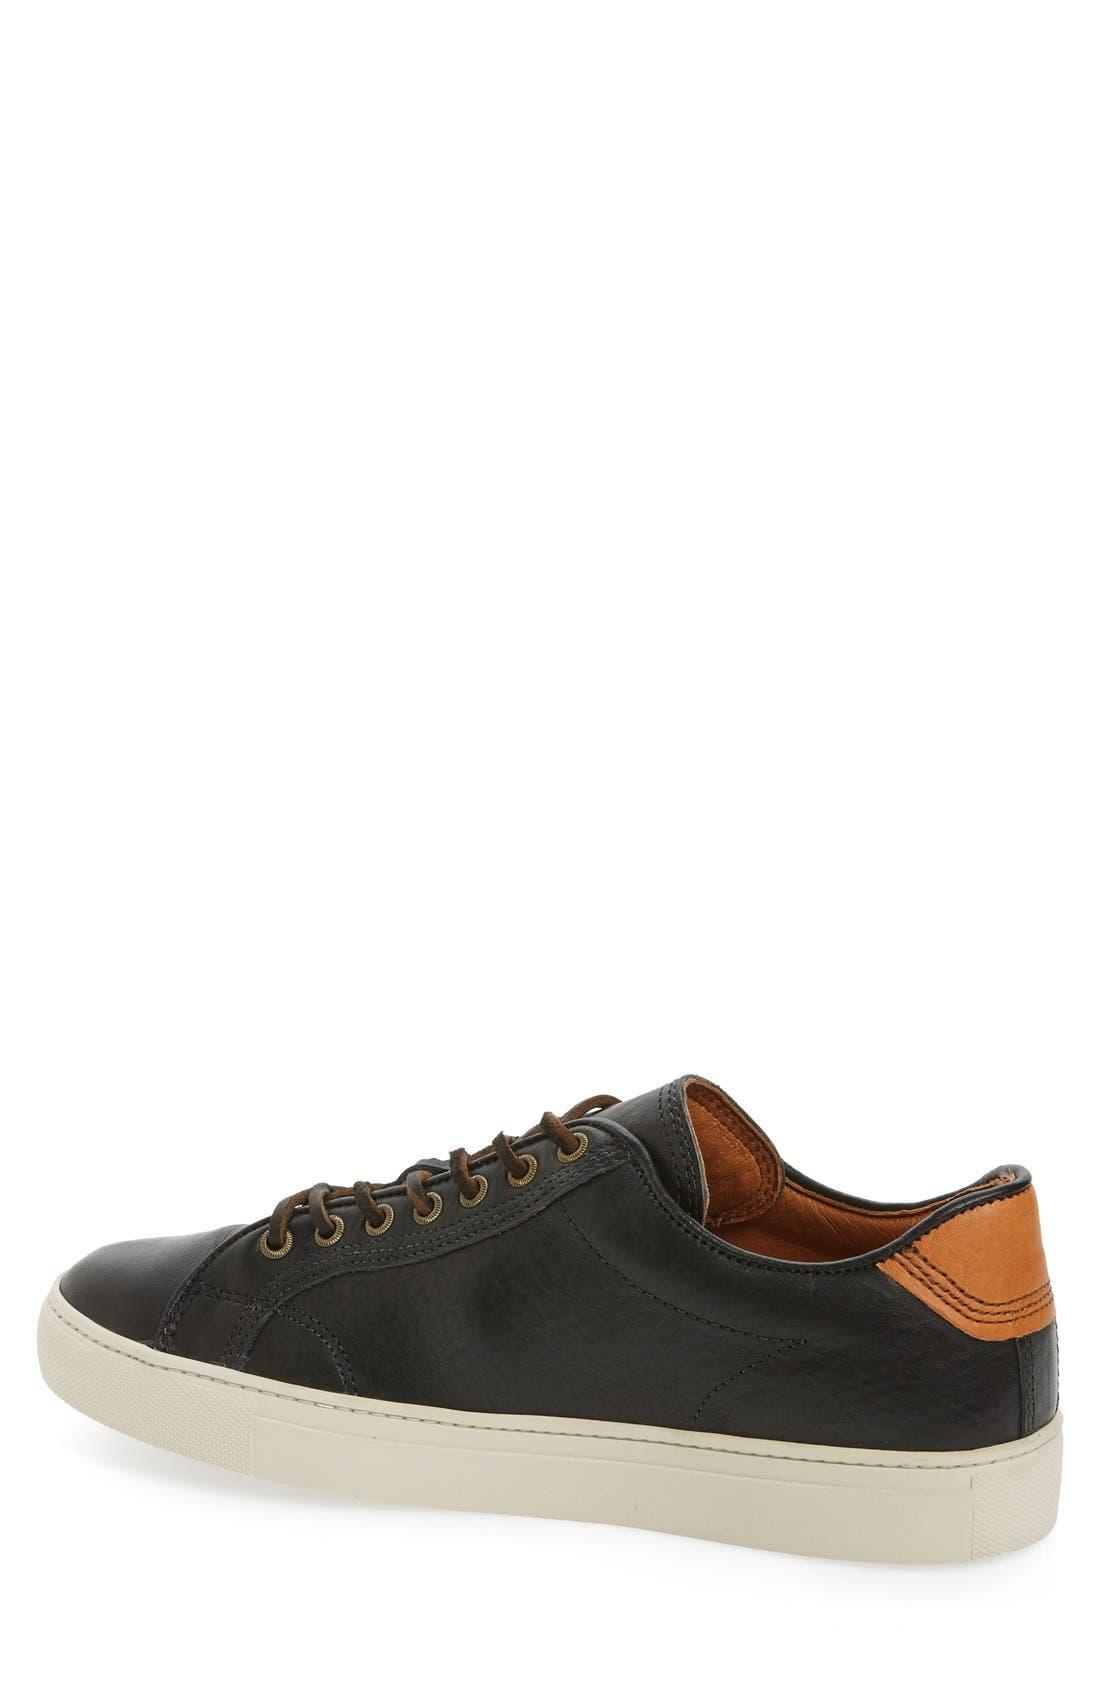 Walker Low Top Sneaker,                             Alternate thumbnail 2, color,                             001